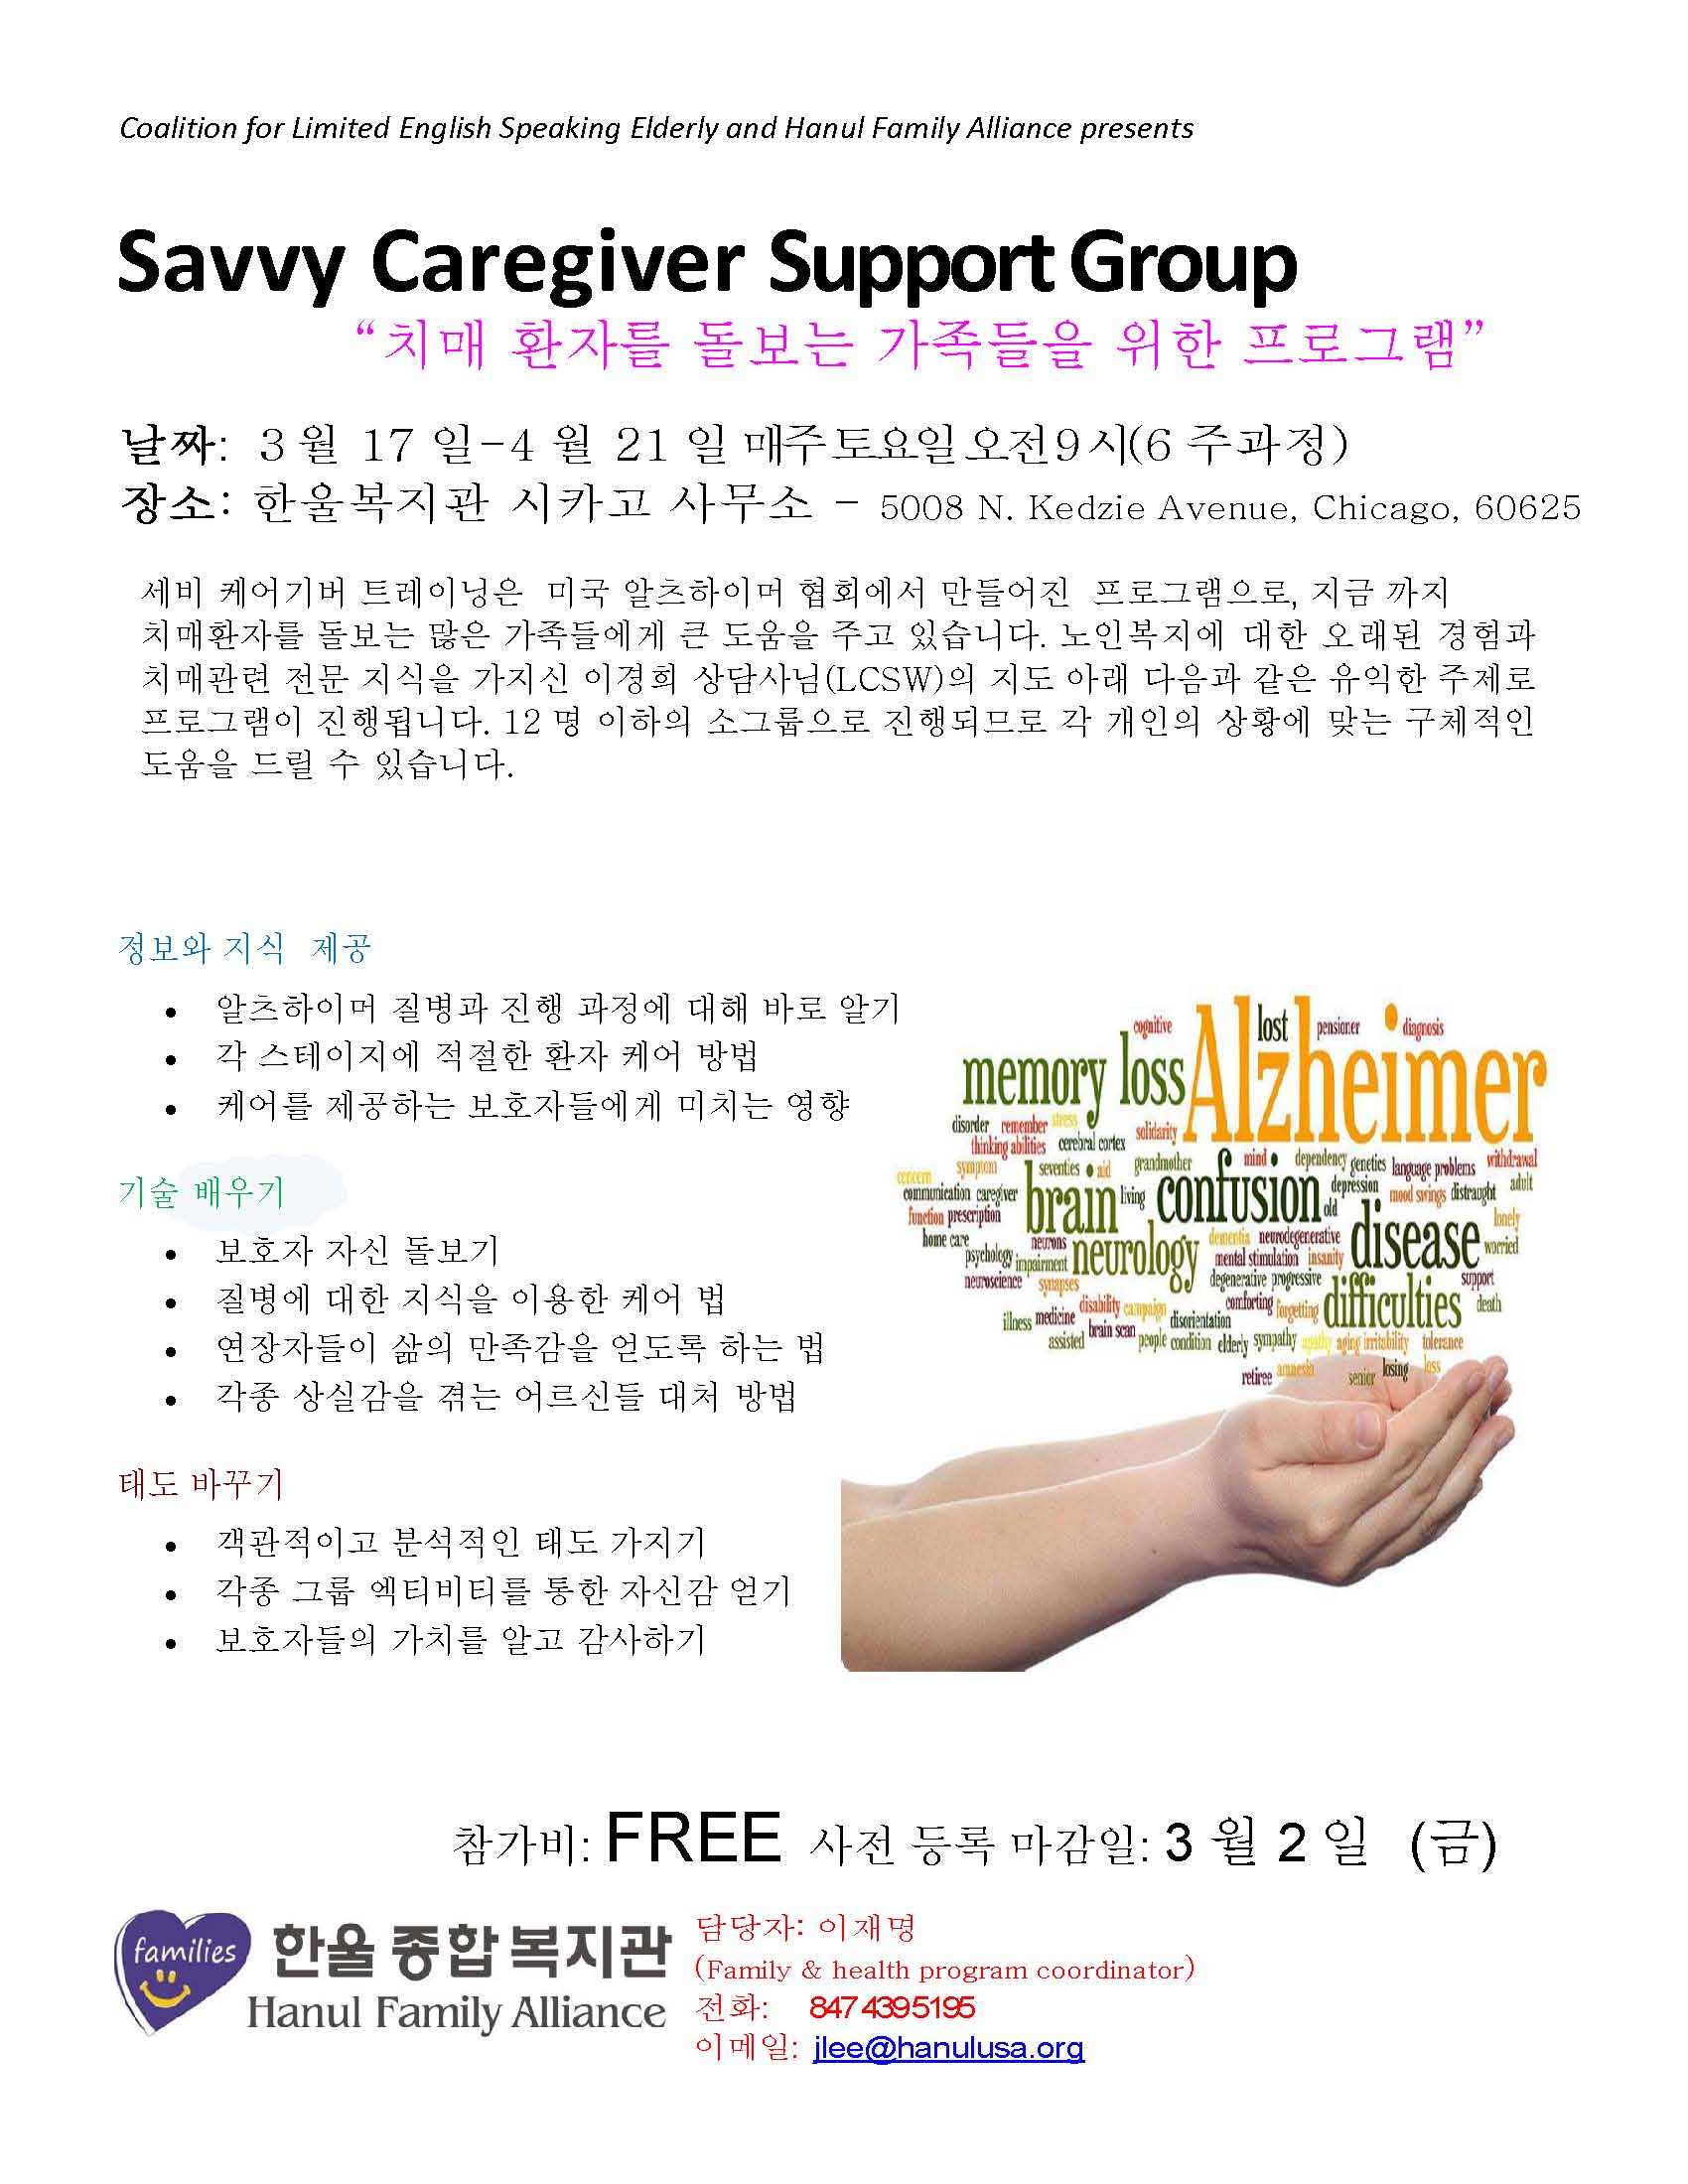 Savvy Caregiver Flyer-Korean - Jan 2018.jpg